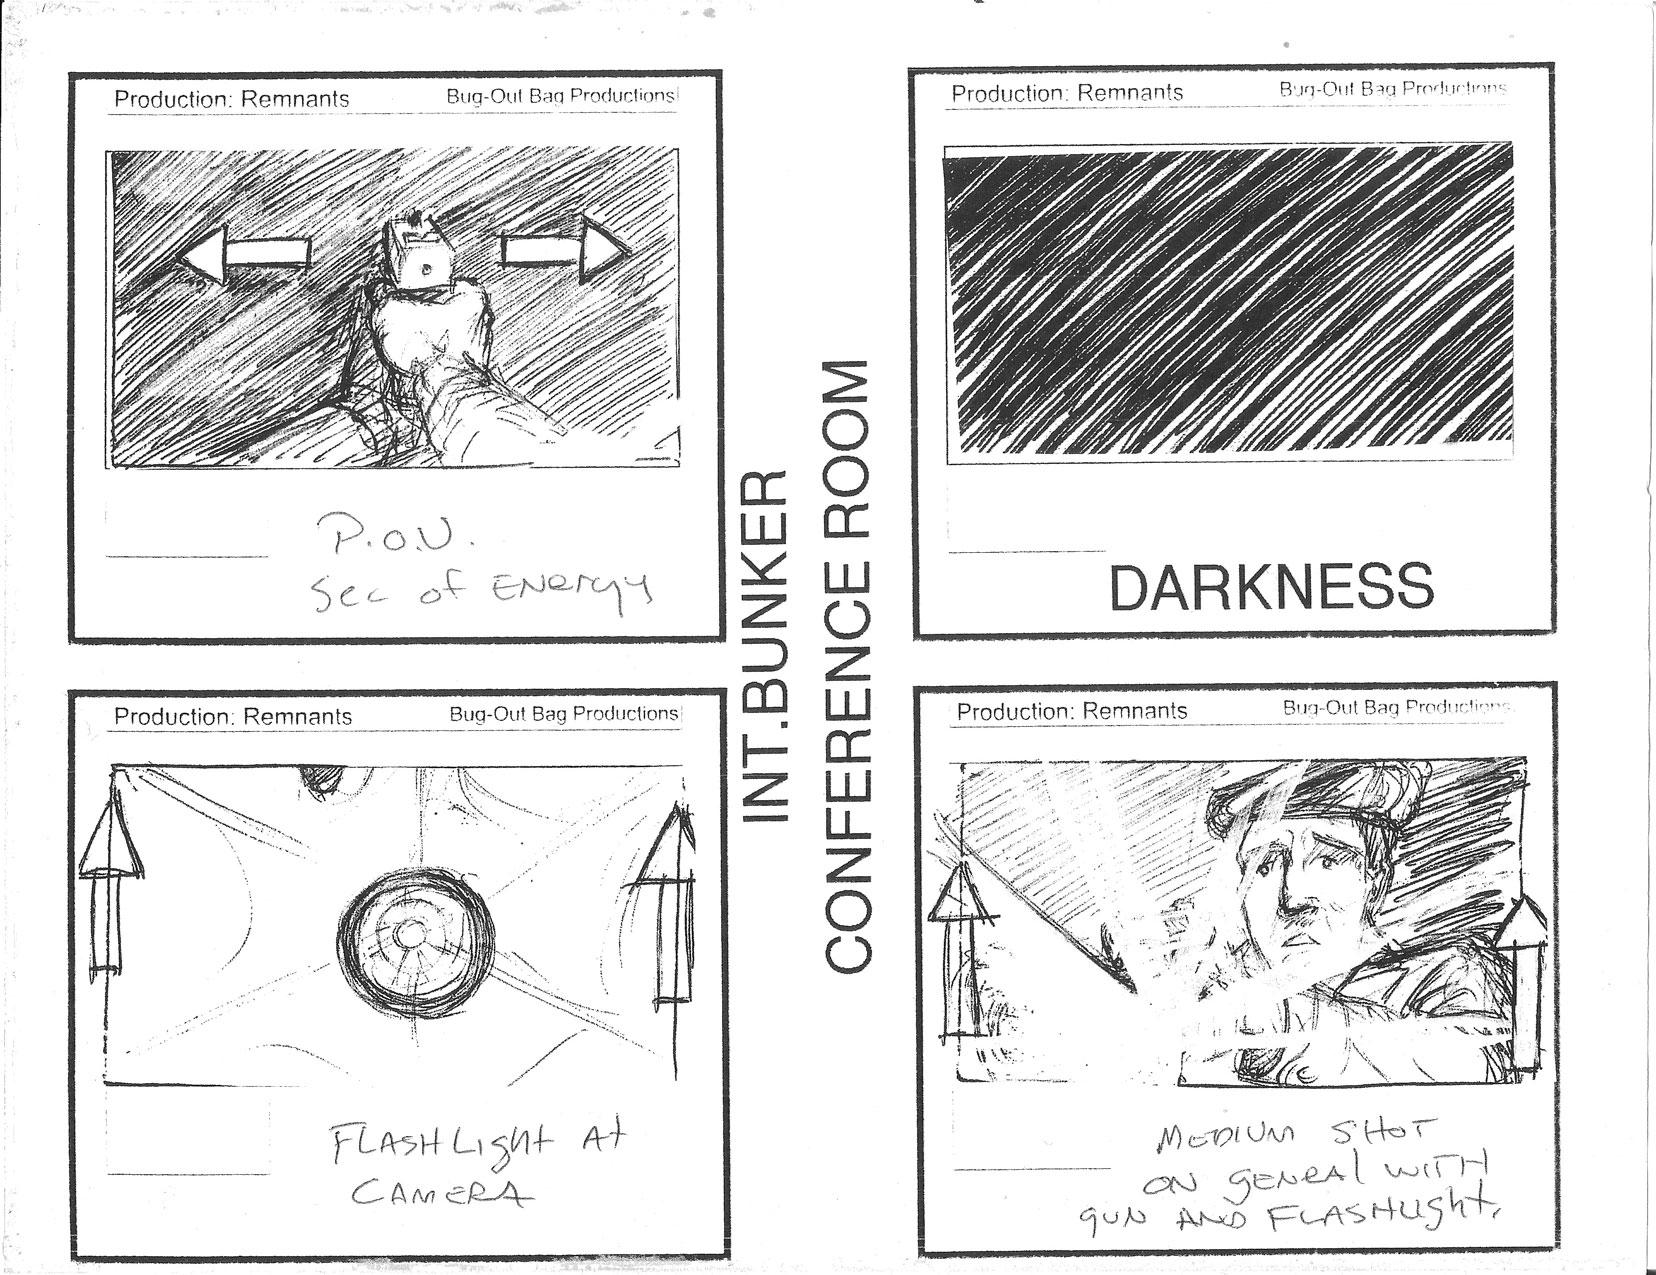 Remnants_storyboards_062.jpg